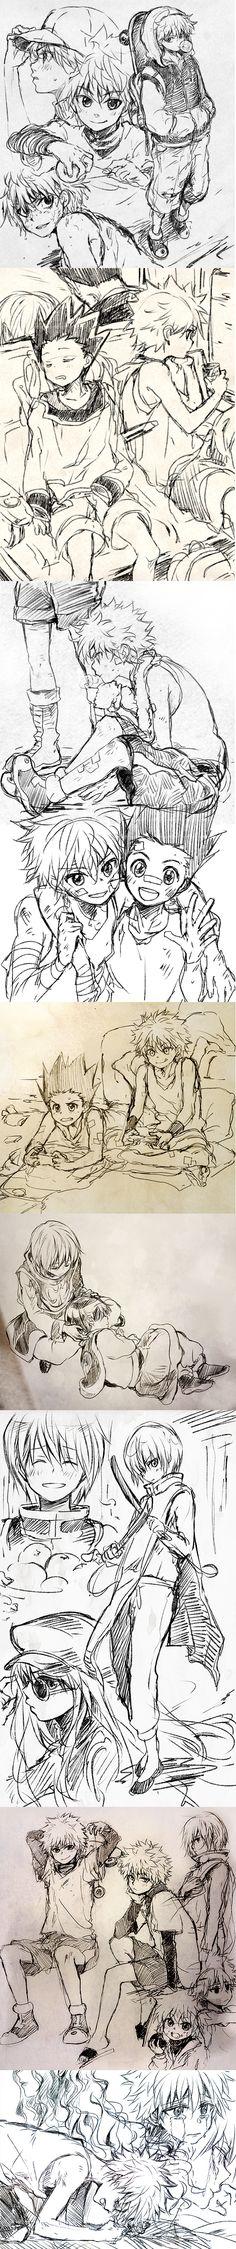 hxh_sketches_by_nuriko_kun-d7dqqtu